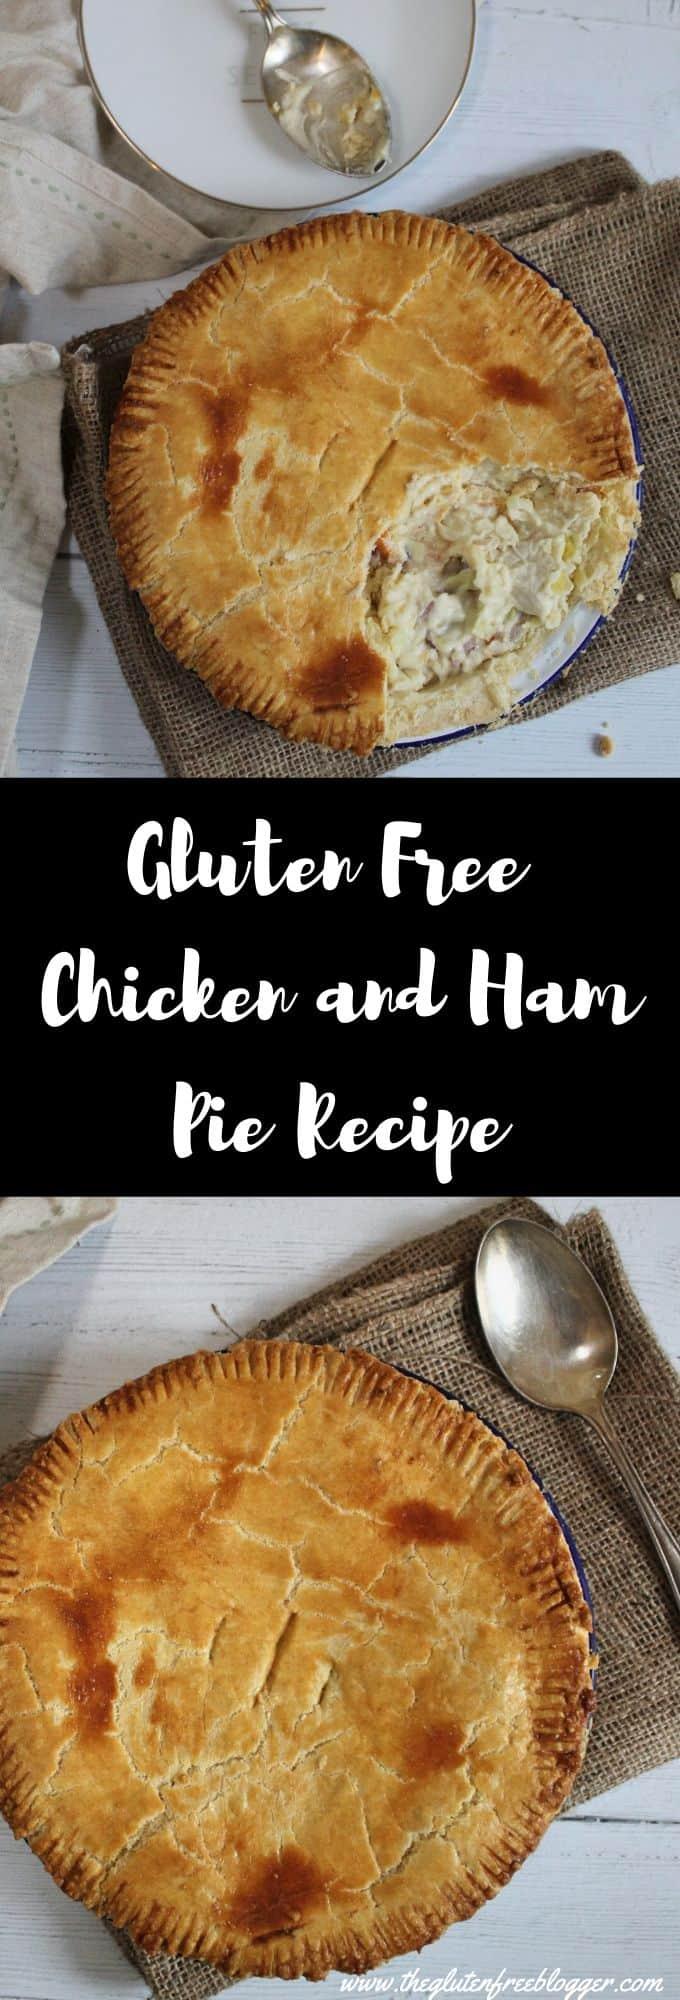 gluten free chicken and ham pie recipe roast dinner christmas leftovers recipe food waste ideas